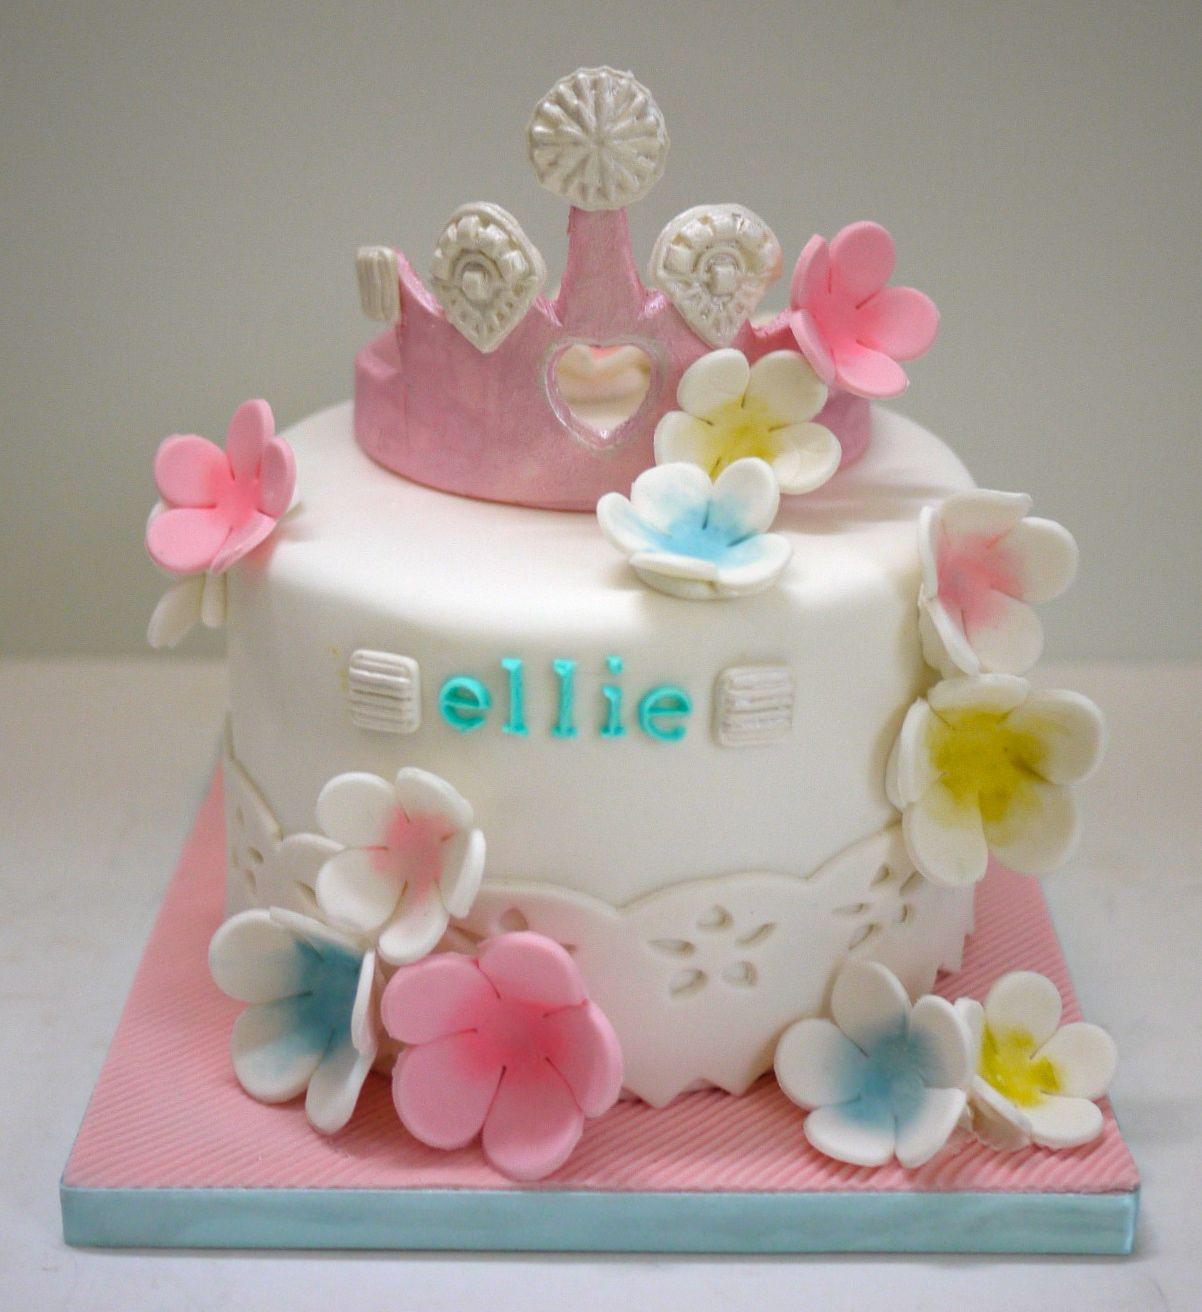 #handmade #handpainting #gâteauxdécoréslyon #OoohMyCake #cakedecorating #birthdaycake #cakedesign #PrincessParty